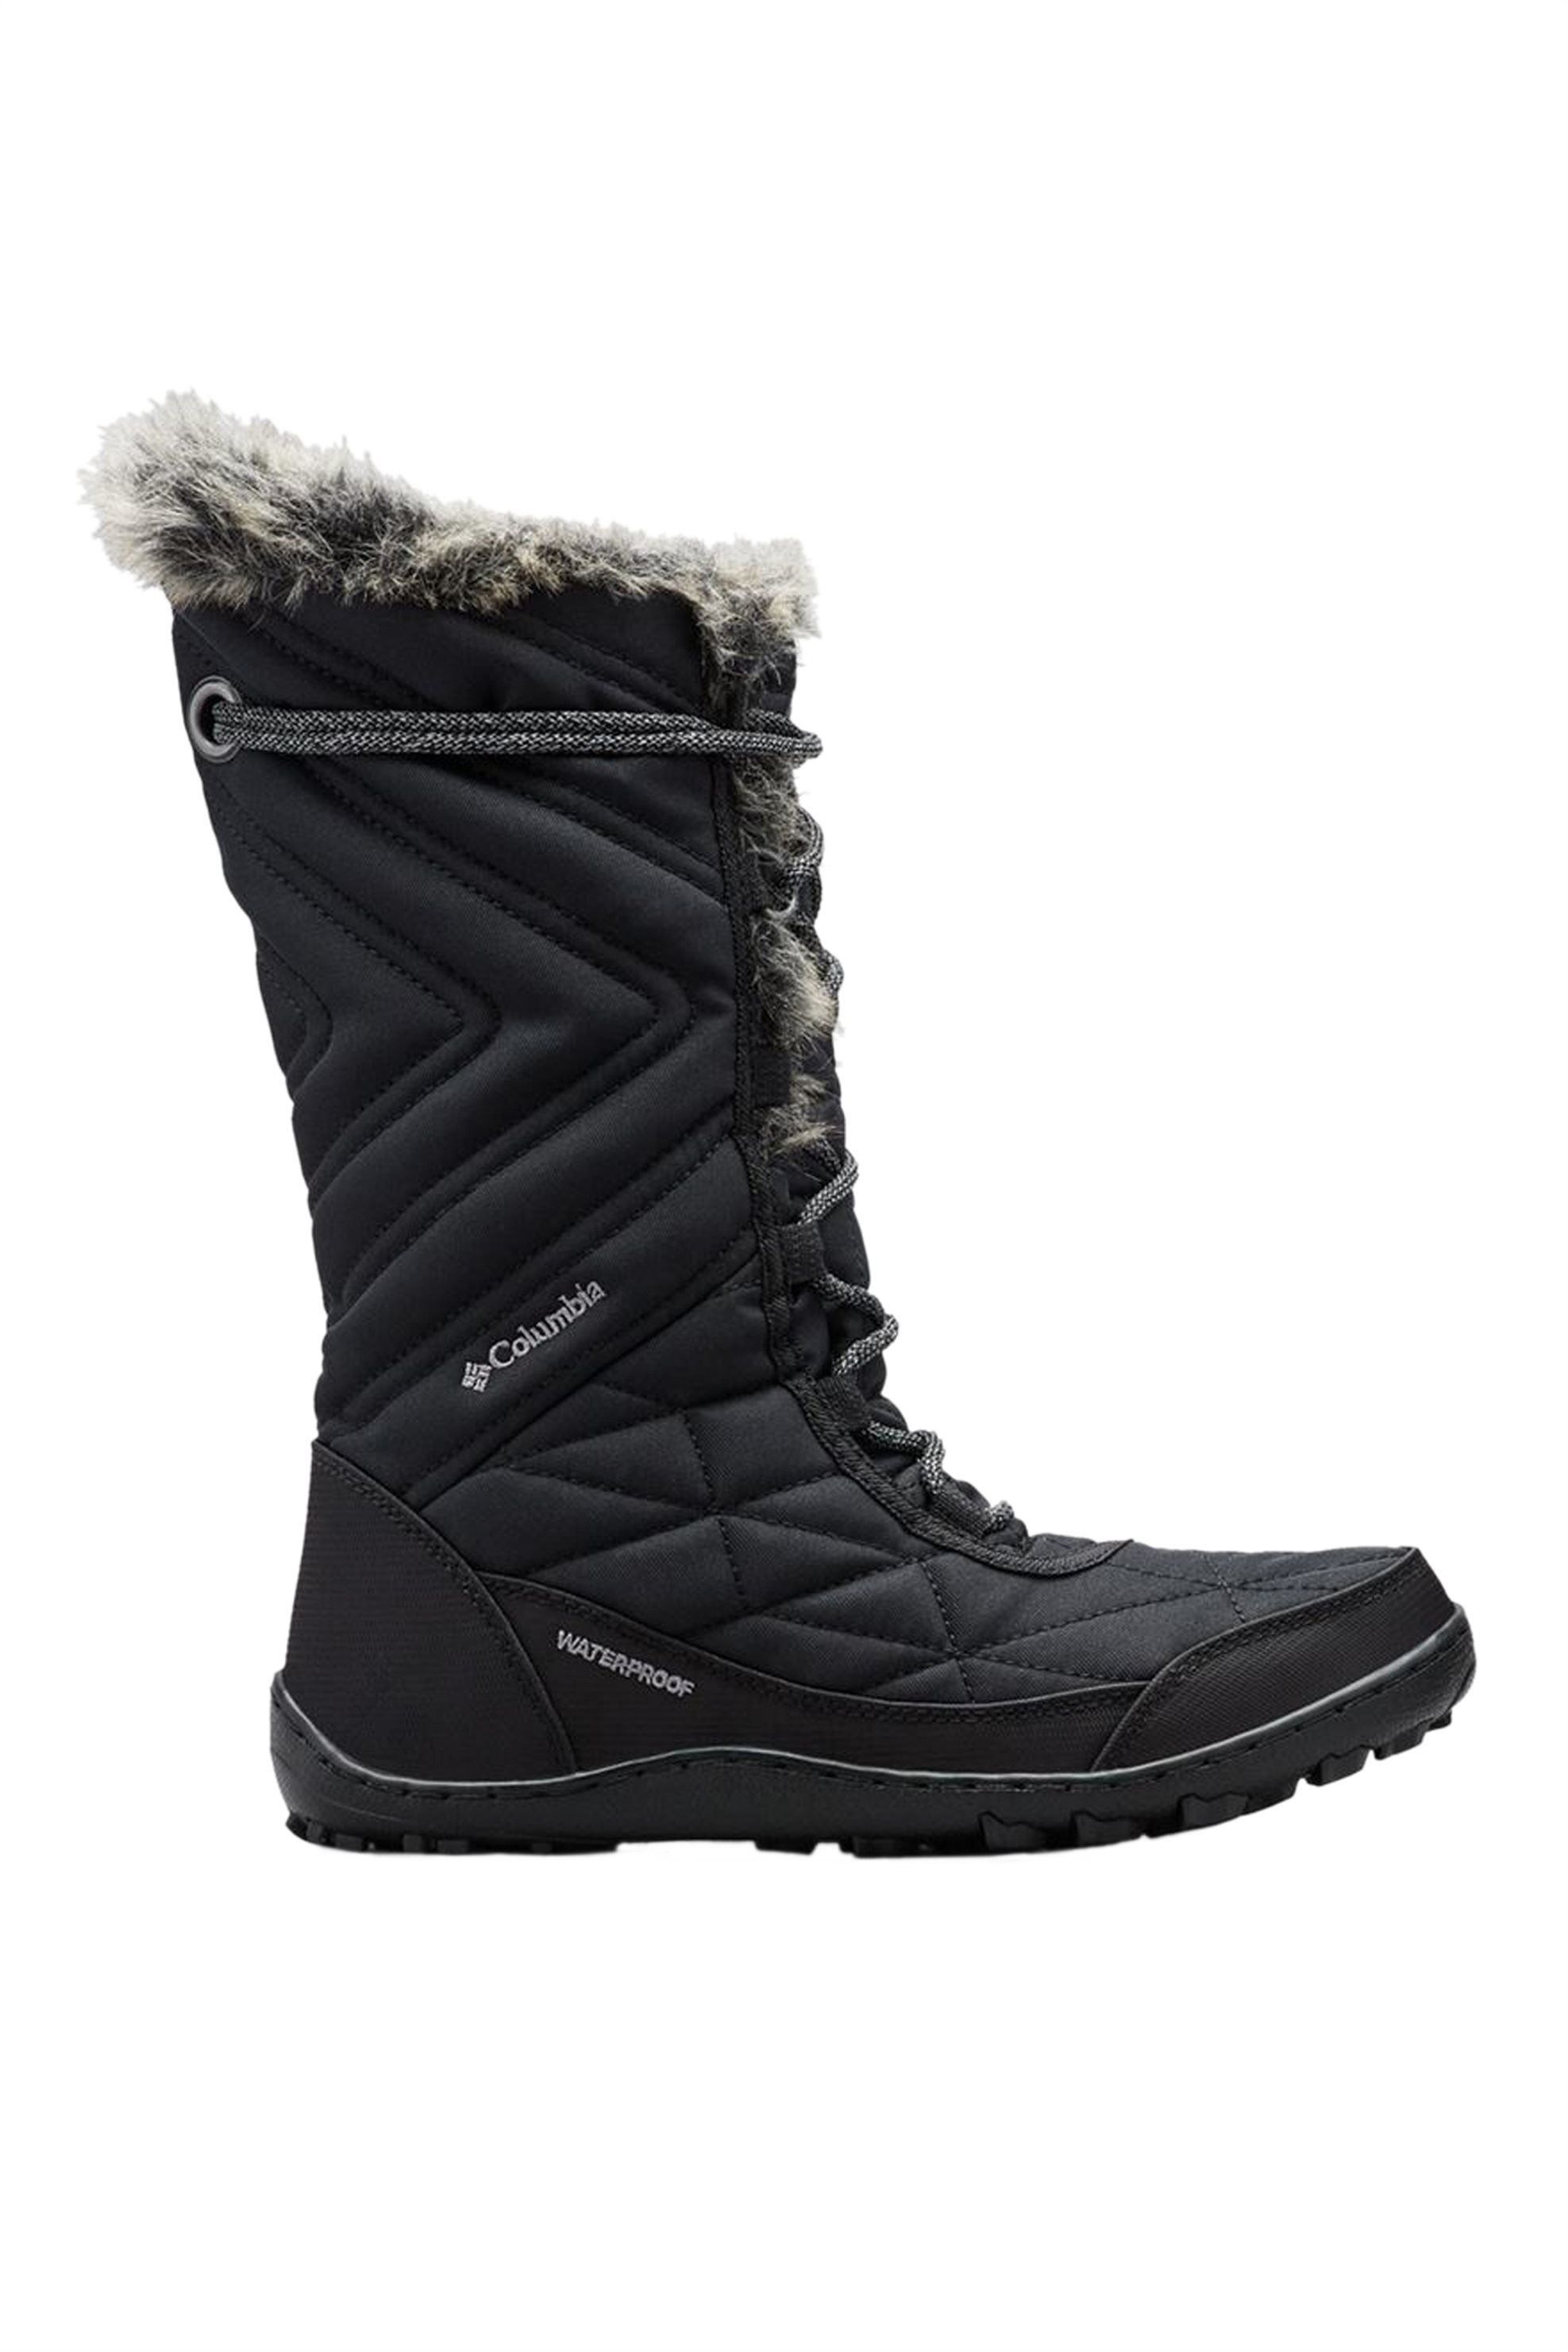 Columbia γυναικείες καπιτονέ μπότες με faux γούνα ''Minx™ Mid III'' - BL59640108+ - Μαύρο